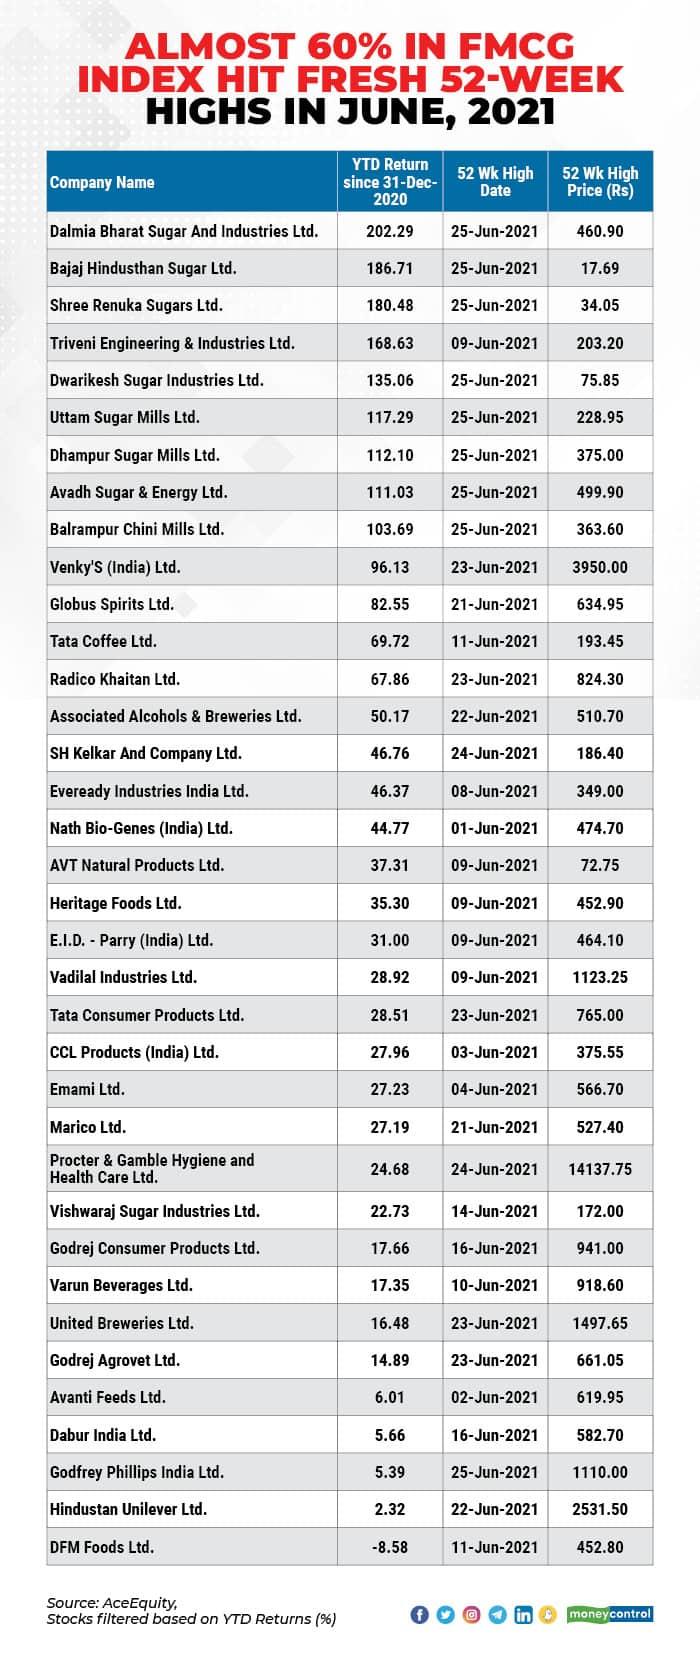 FMCG stocks 2806_003